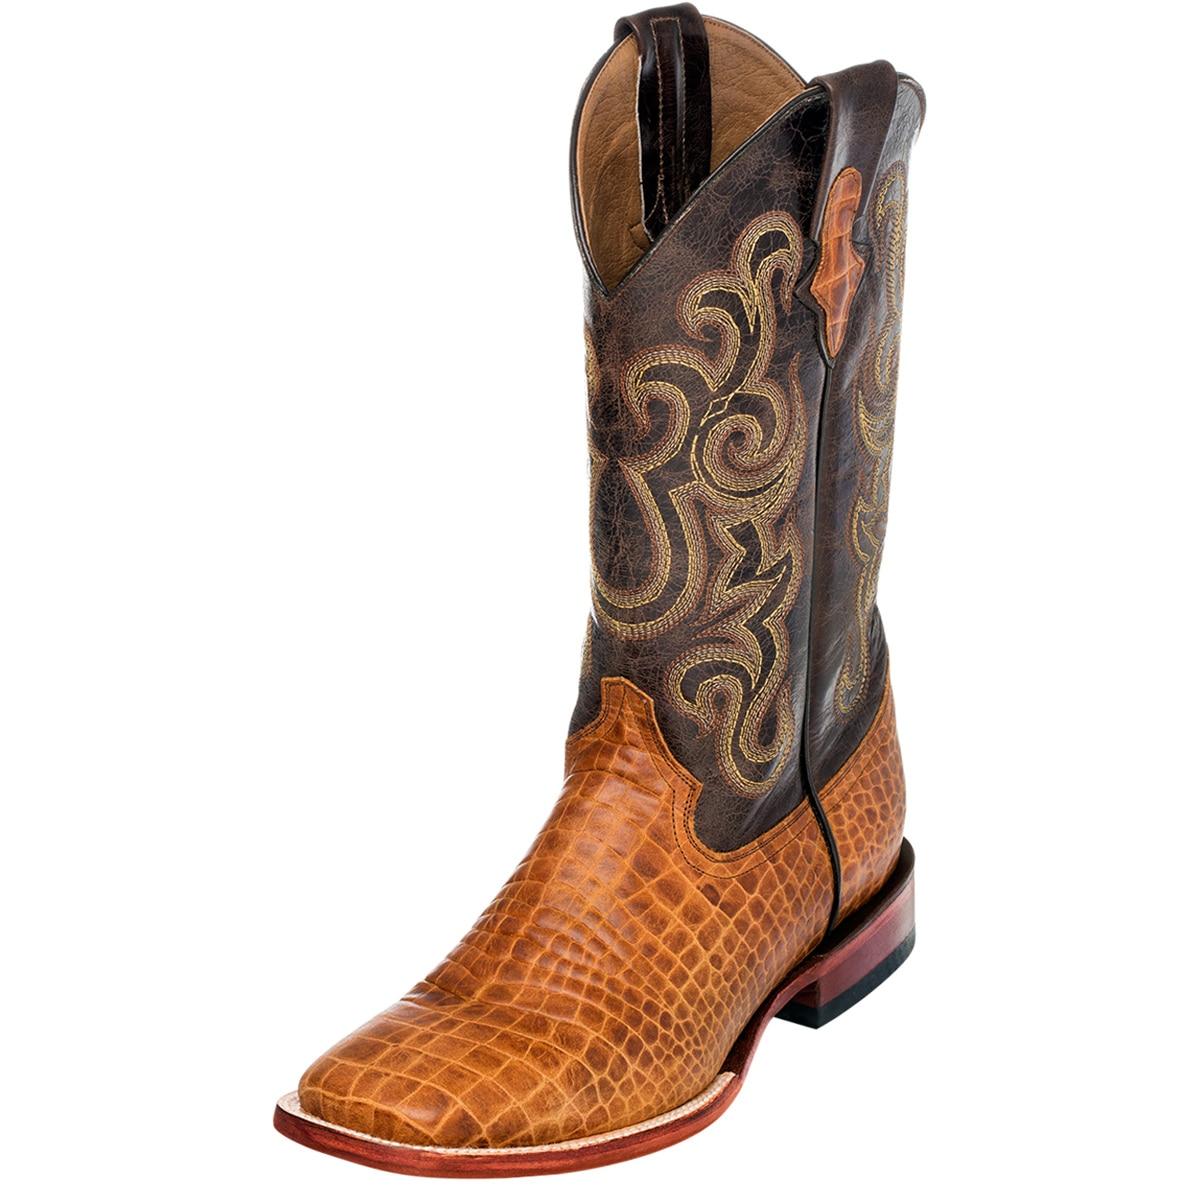 Ferrini Men's Print Caiman Belly Boots